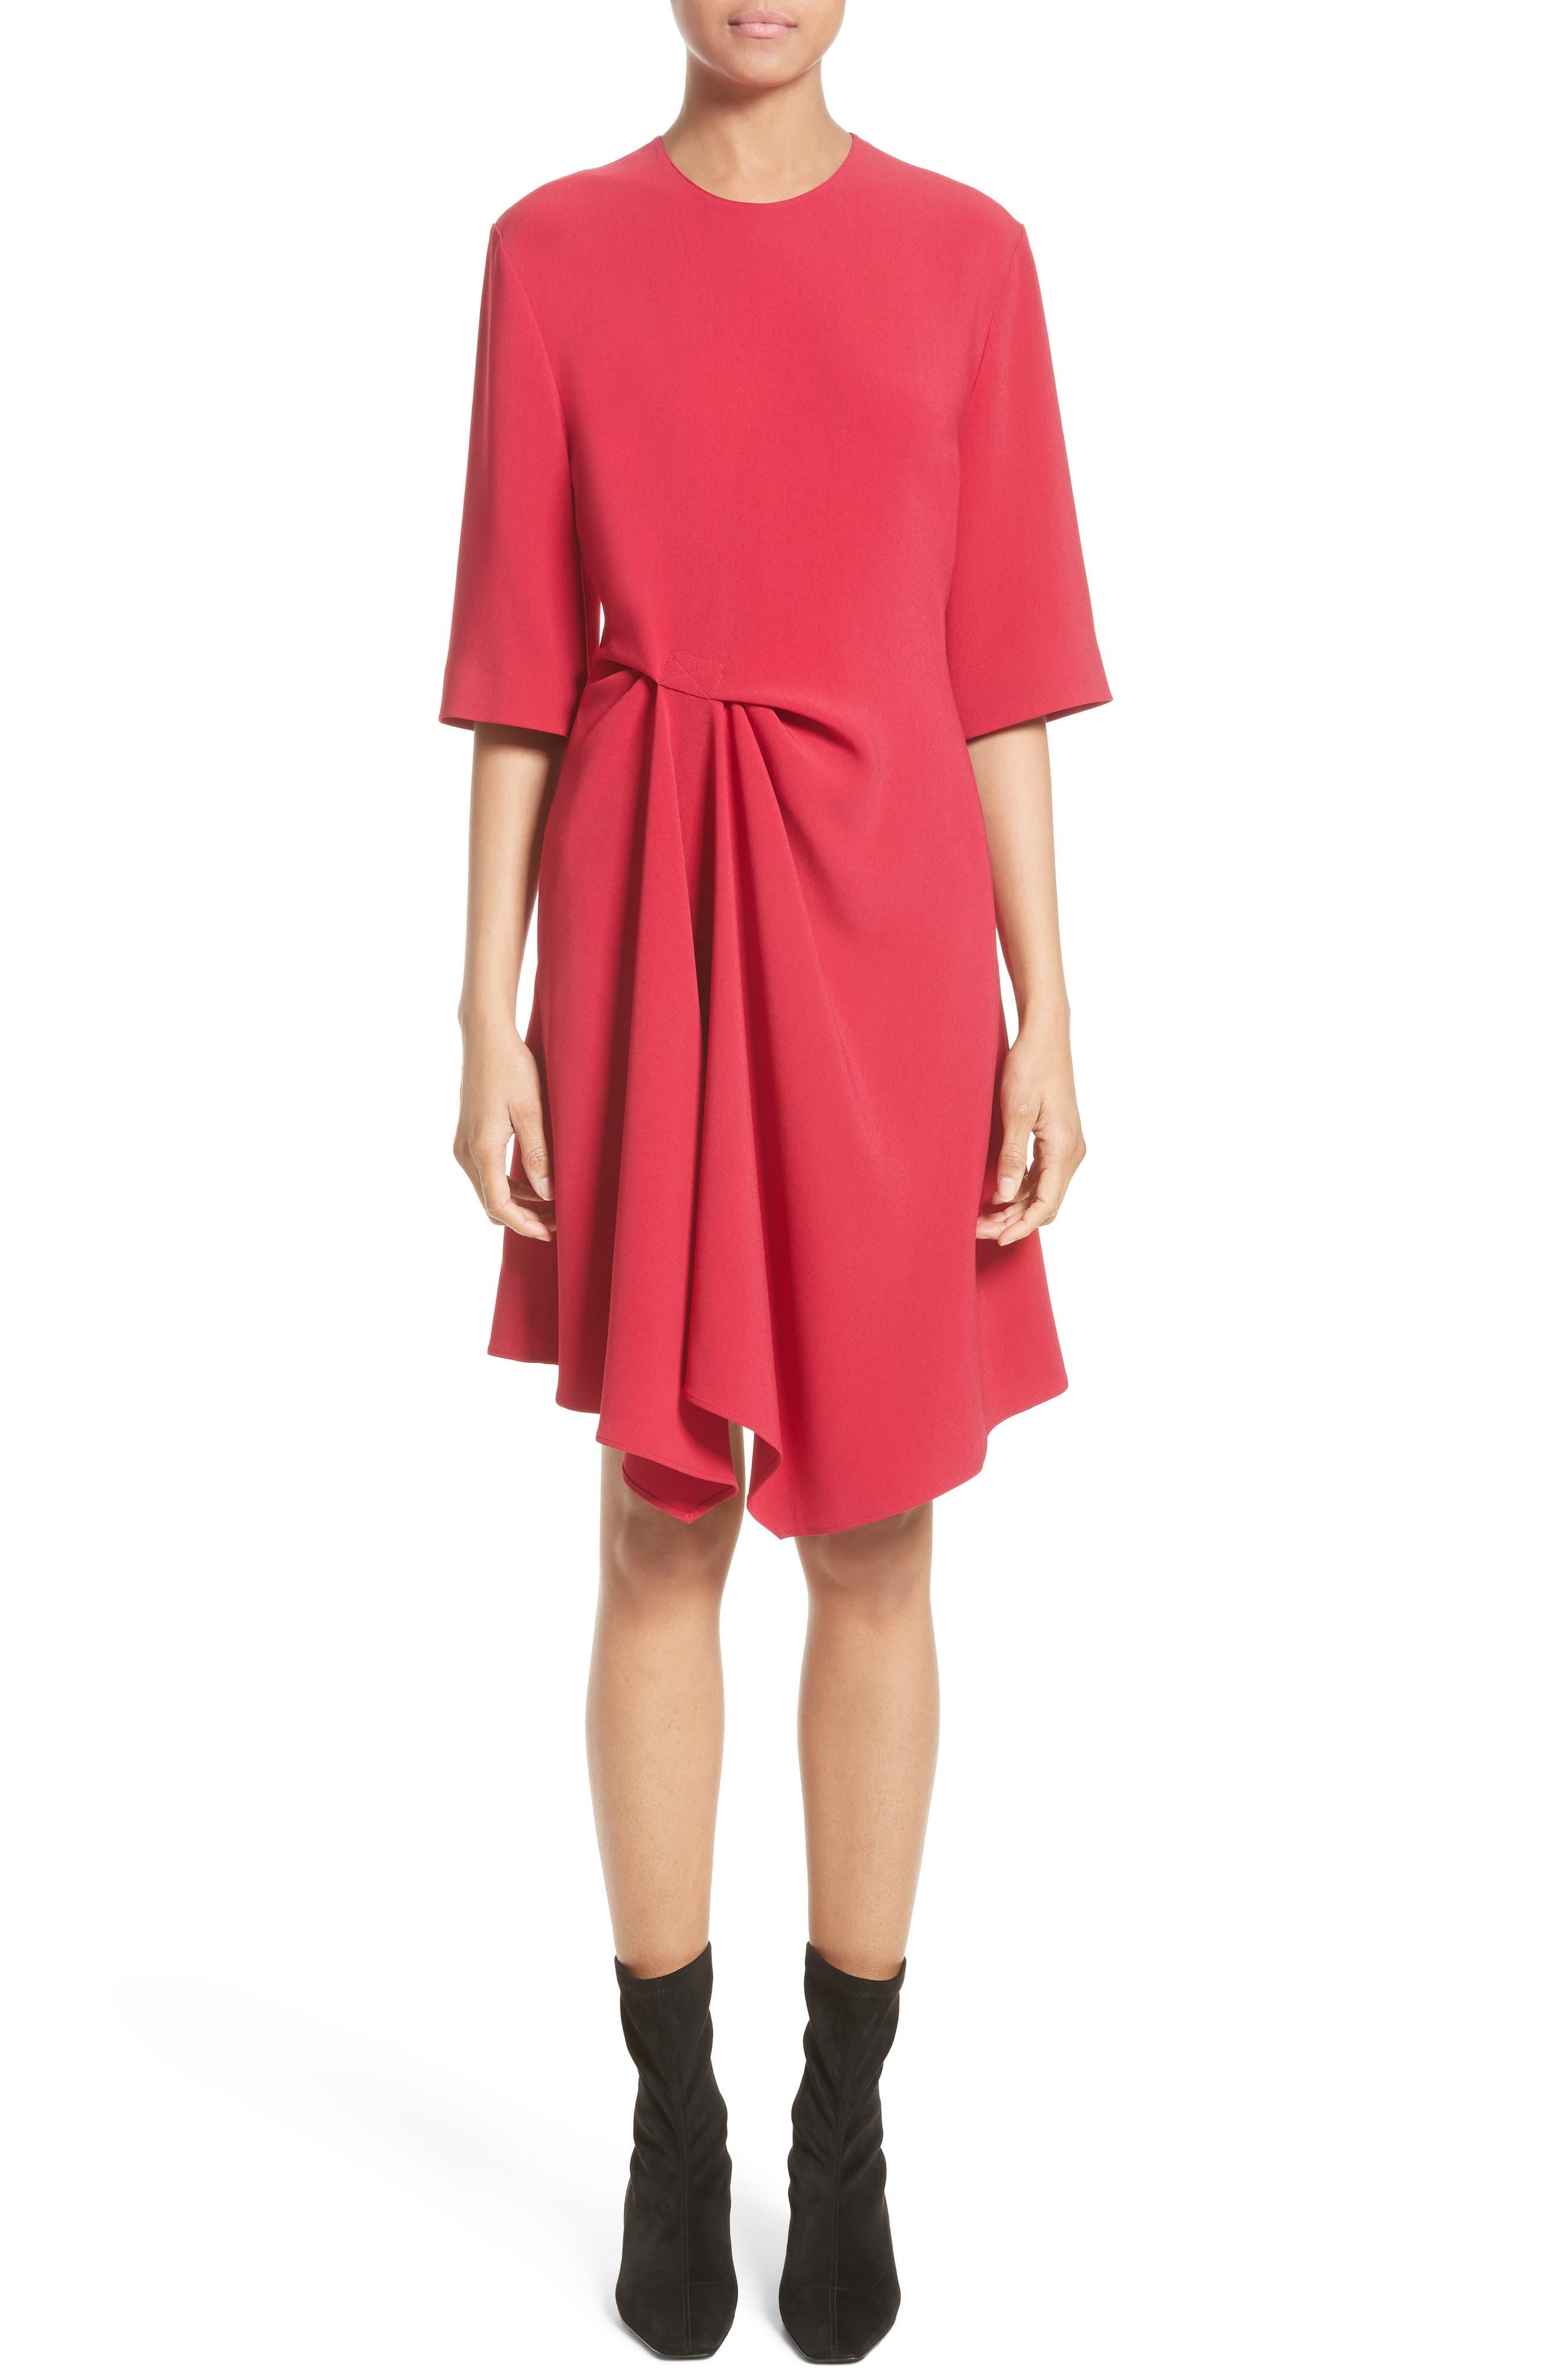 Stella McCartney Draped Stretch Cady Dress